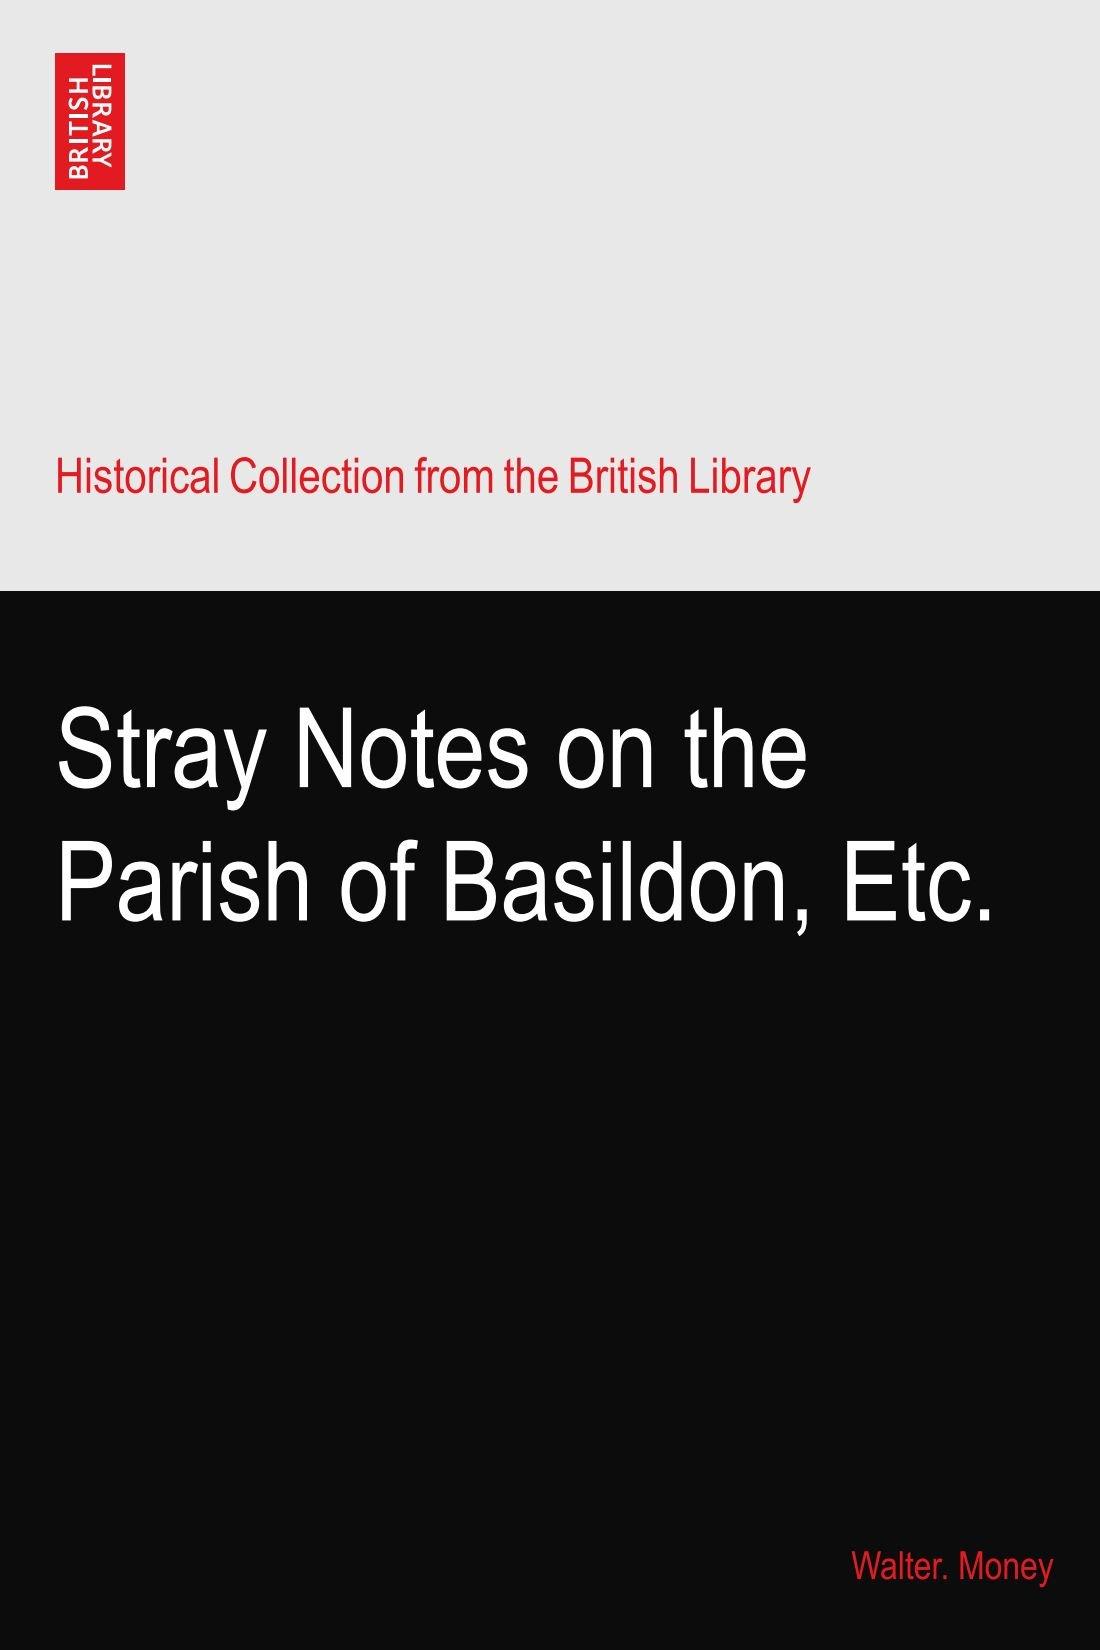 Stray Notes on the Parish of Basildon, Etc. ebook